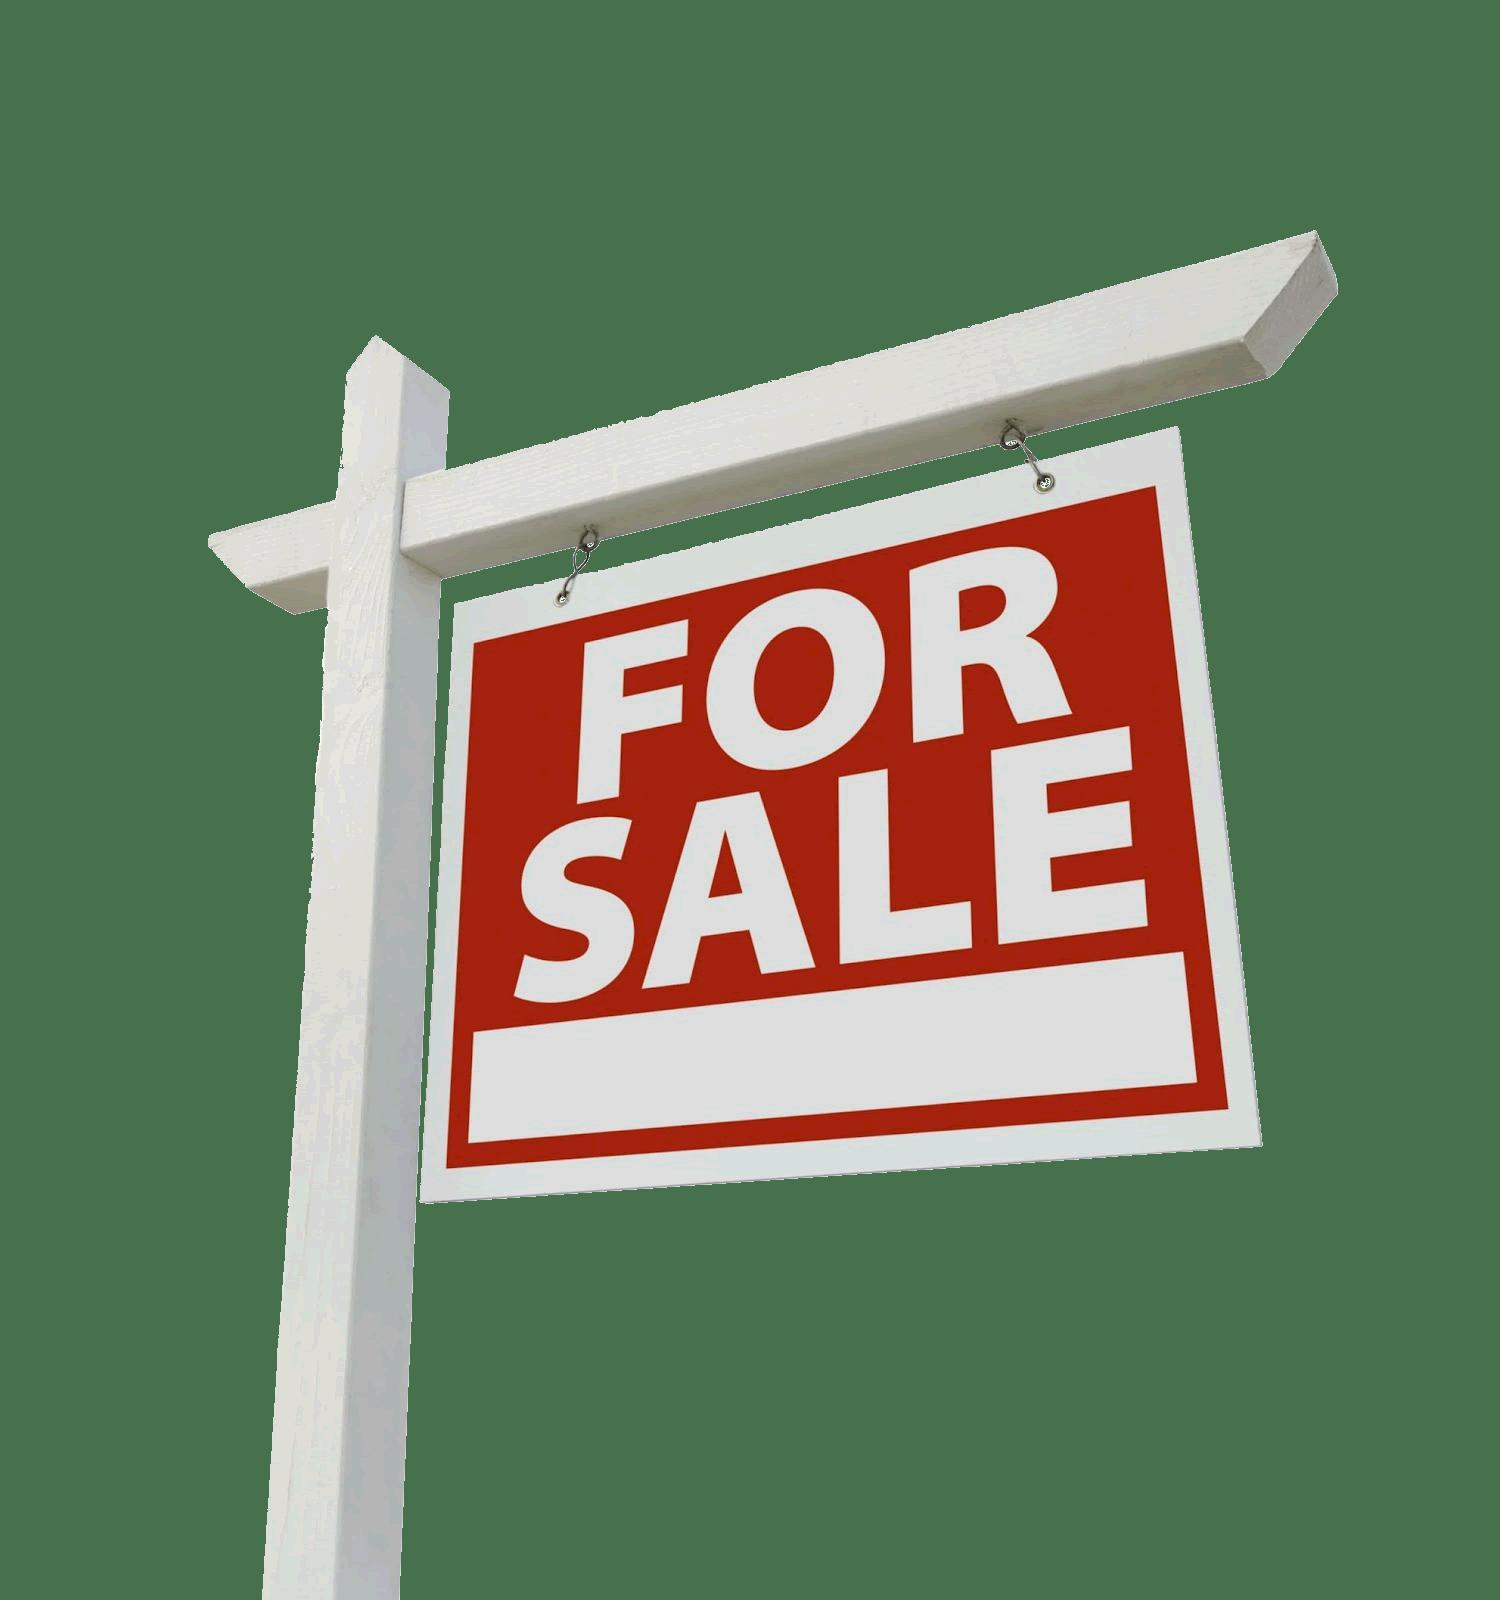 For Sale Hanging Sign transparent PNG.